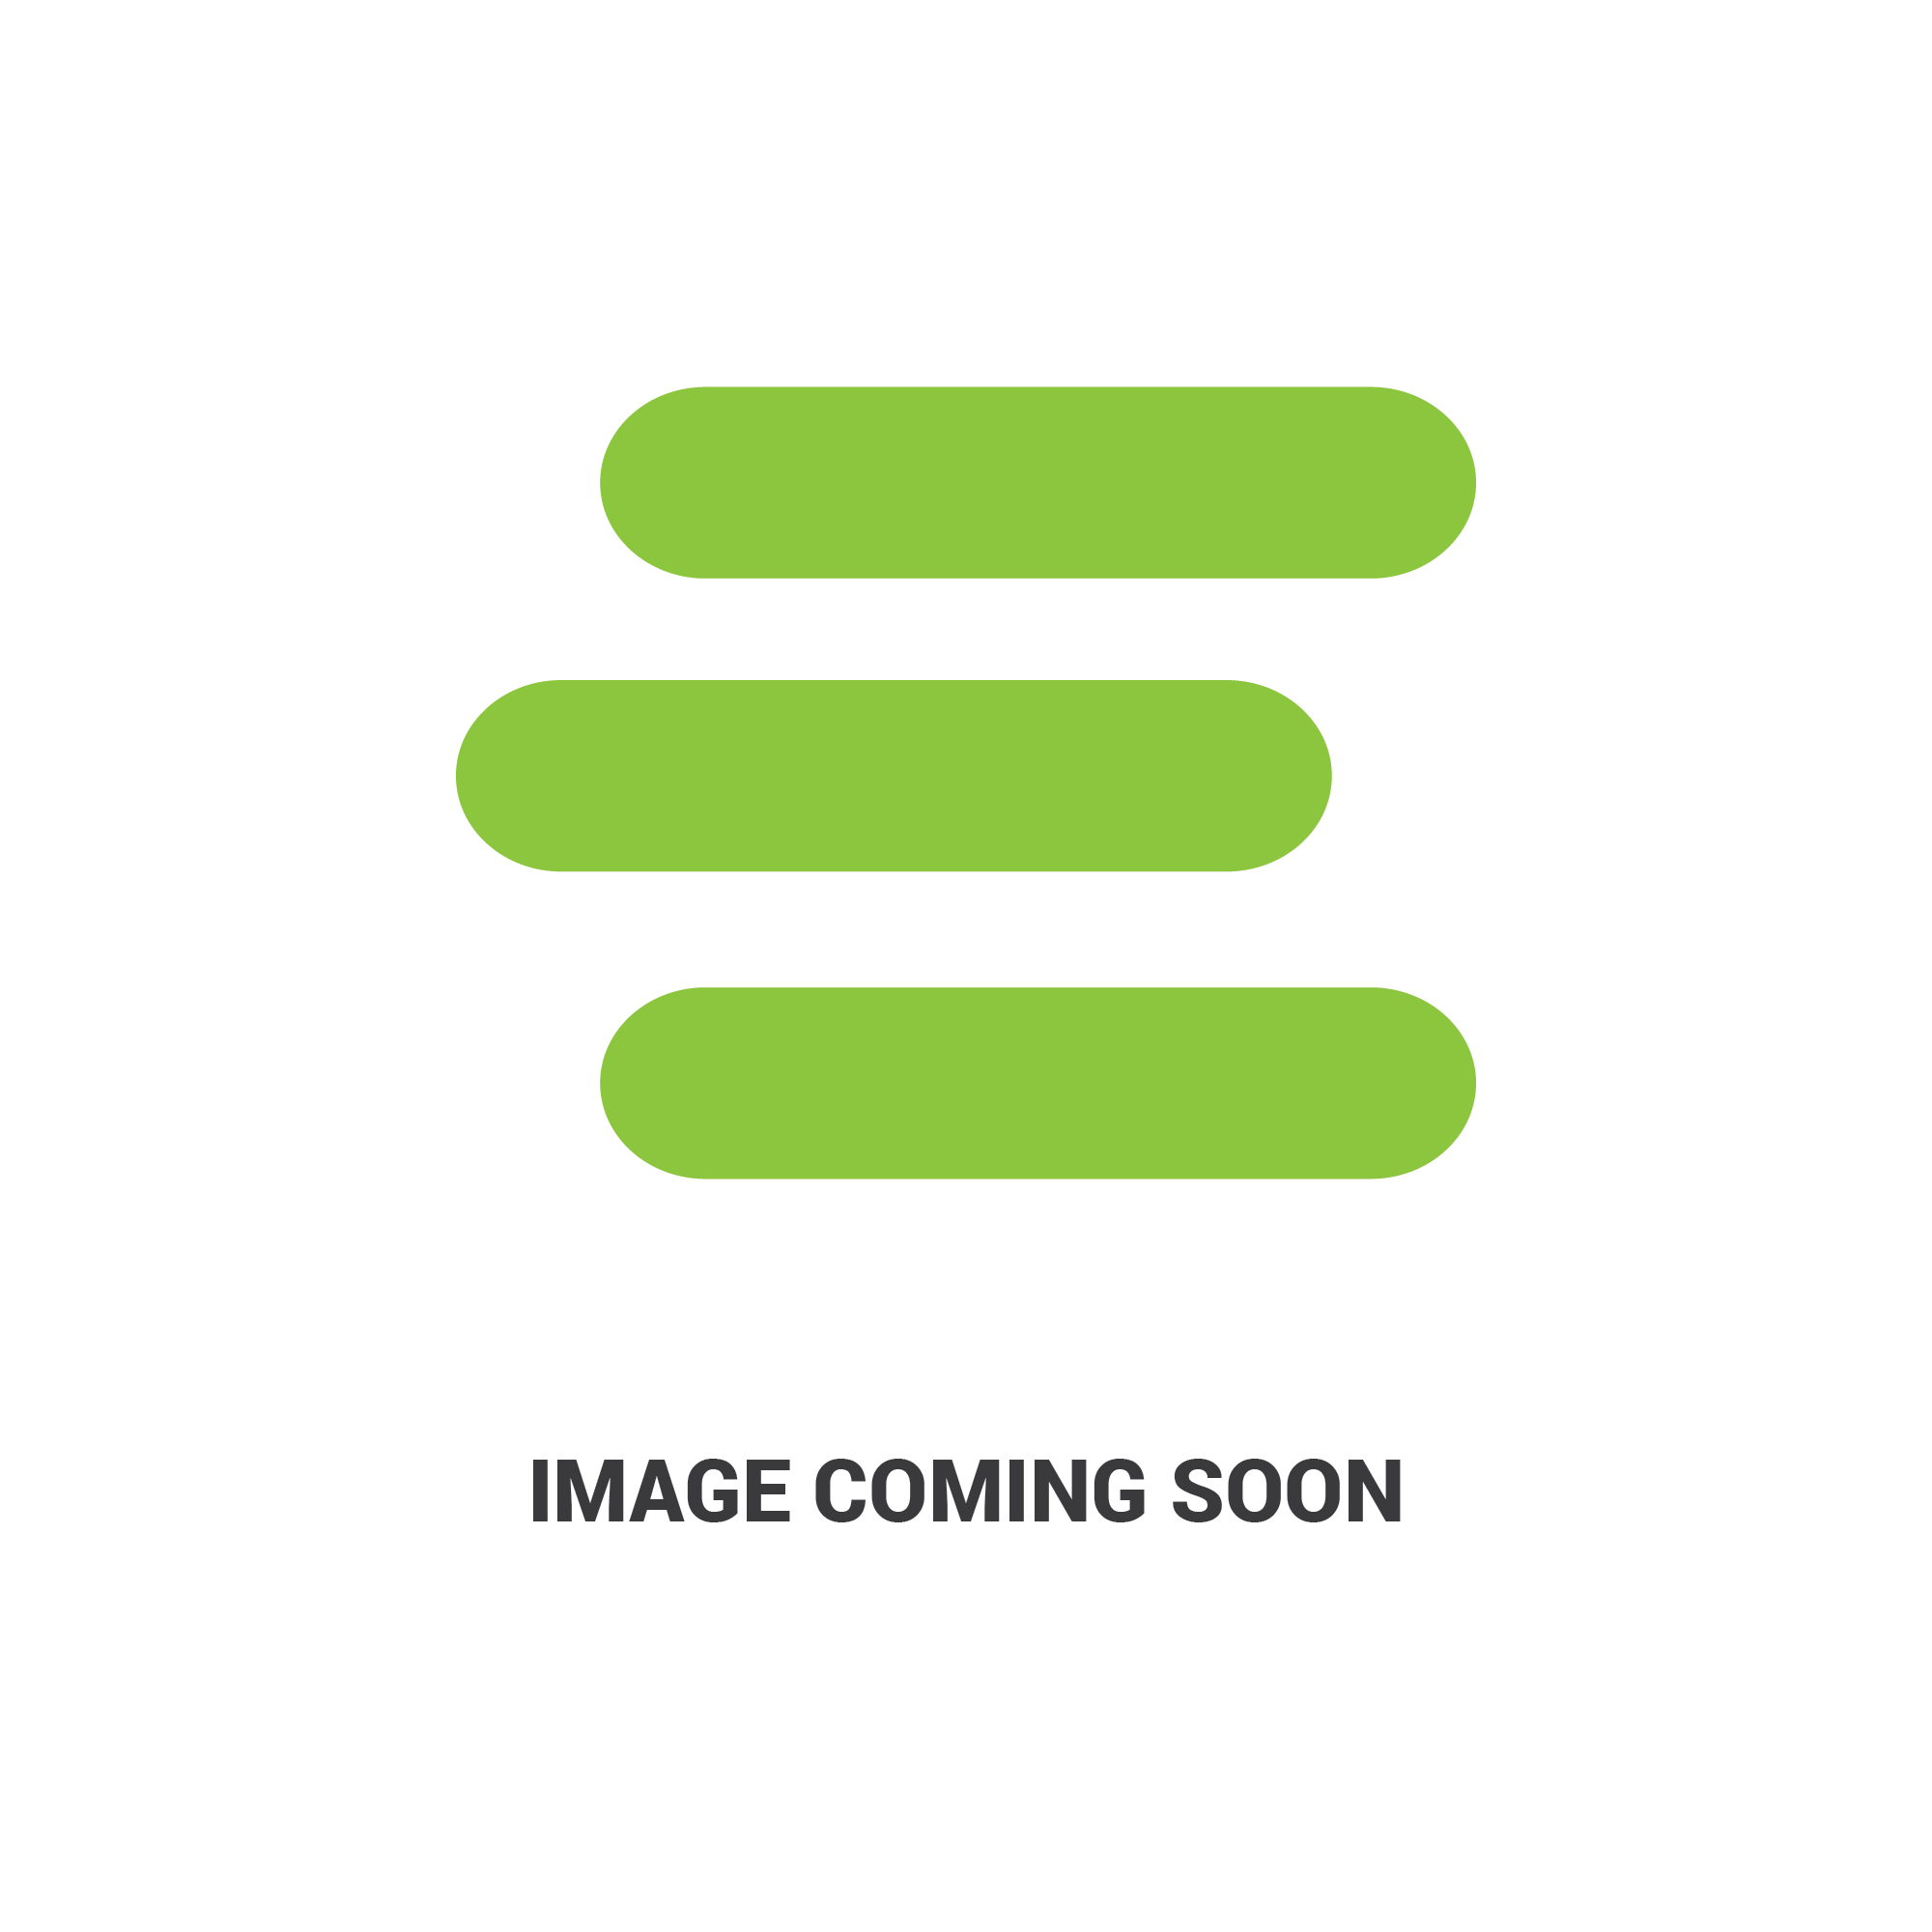 E-163361edit 1.jpg